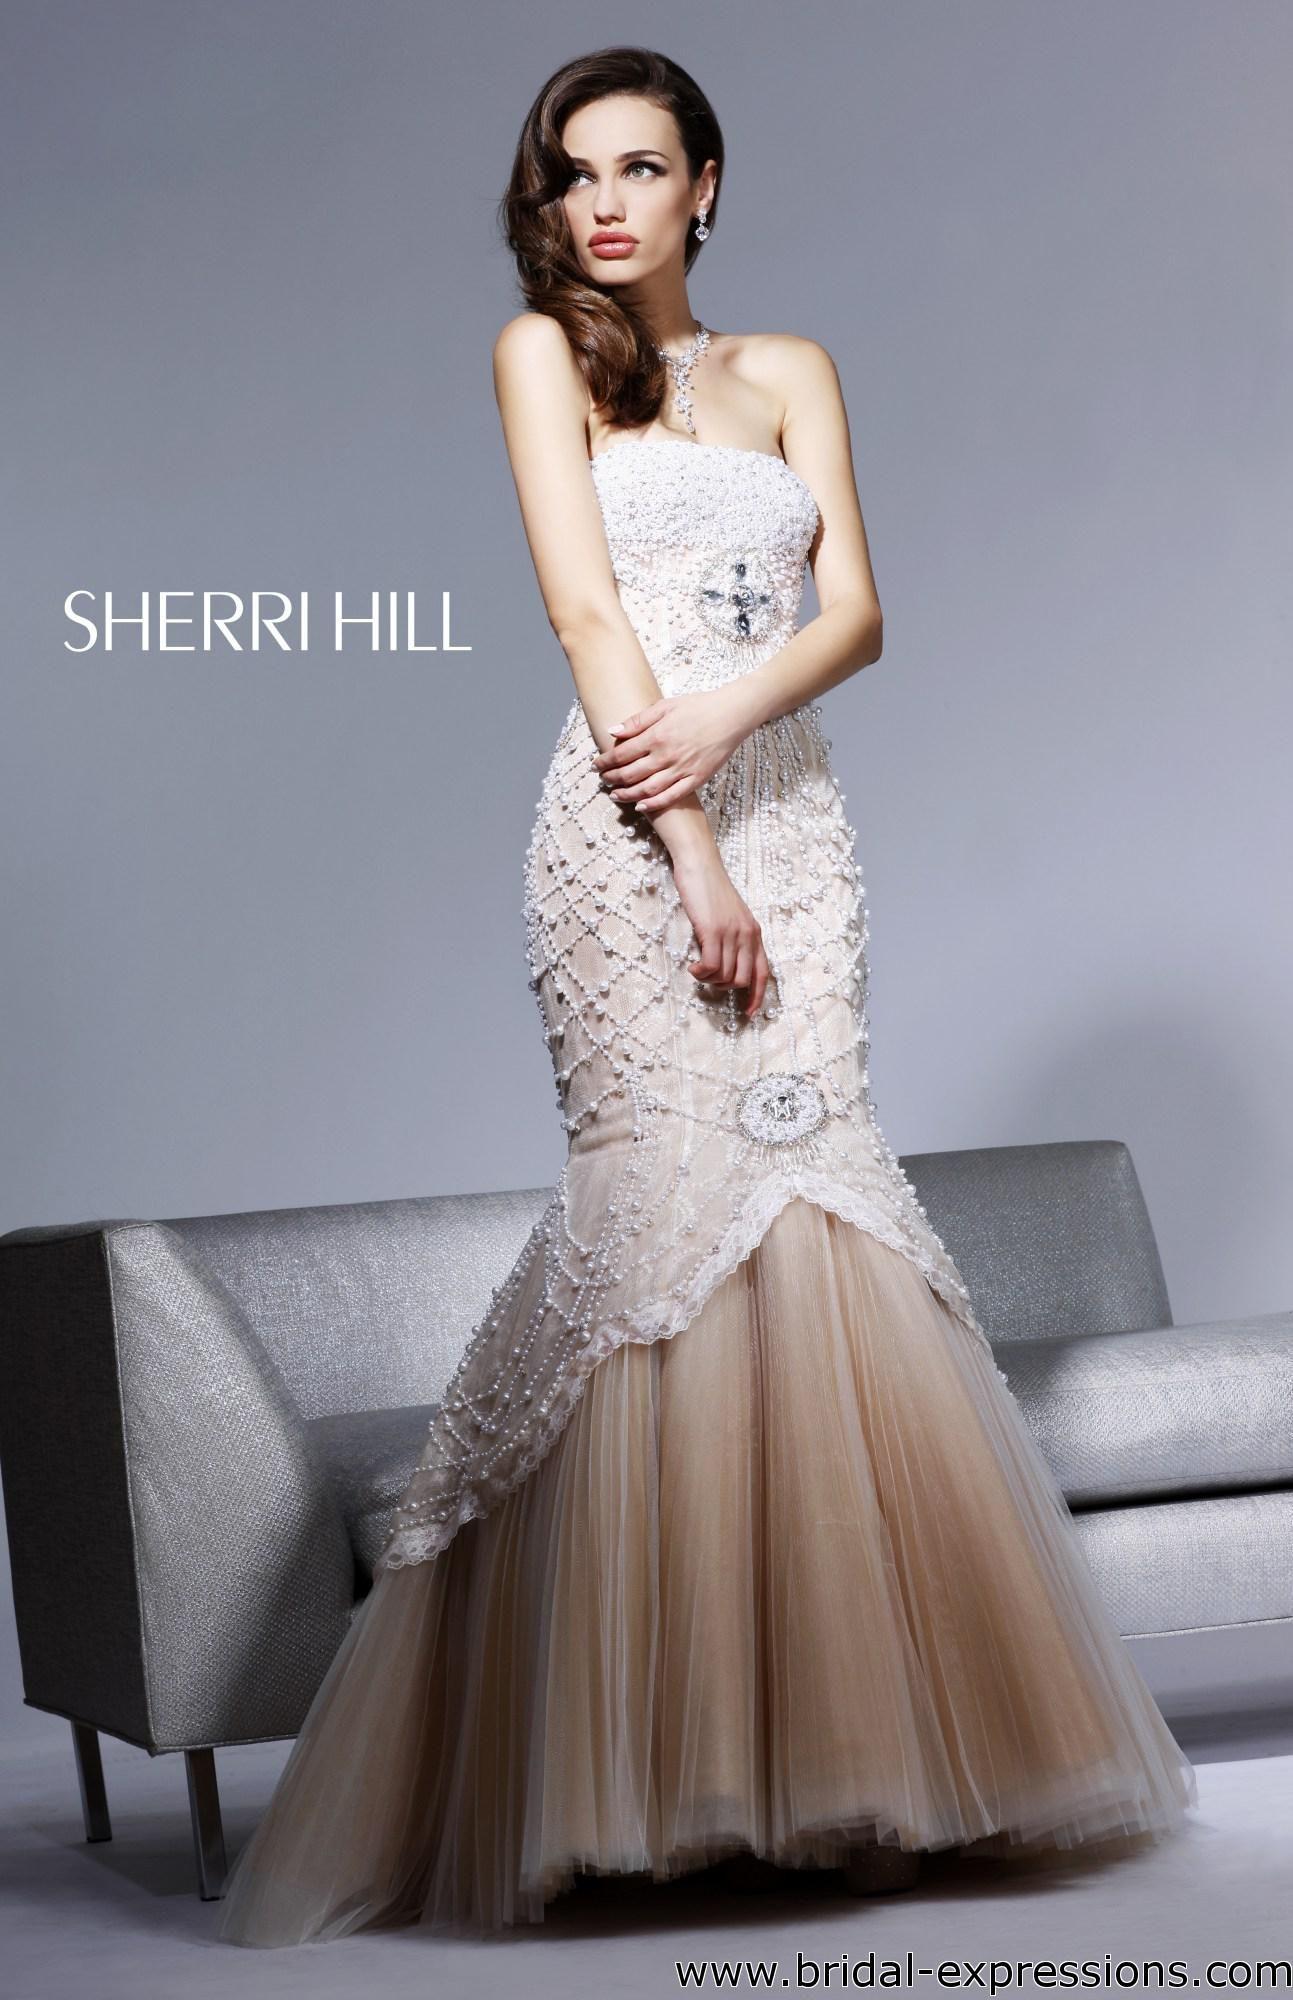 Caroline Forbes Ball Gown | Sherri Hill 2789 Beaded Mermaid Prom ...